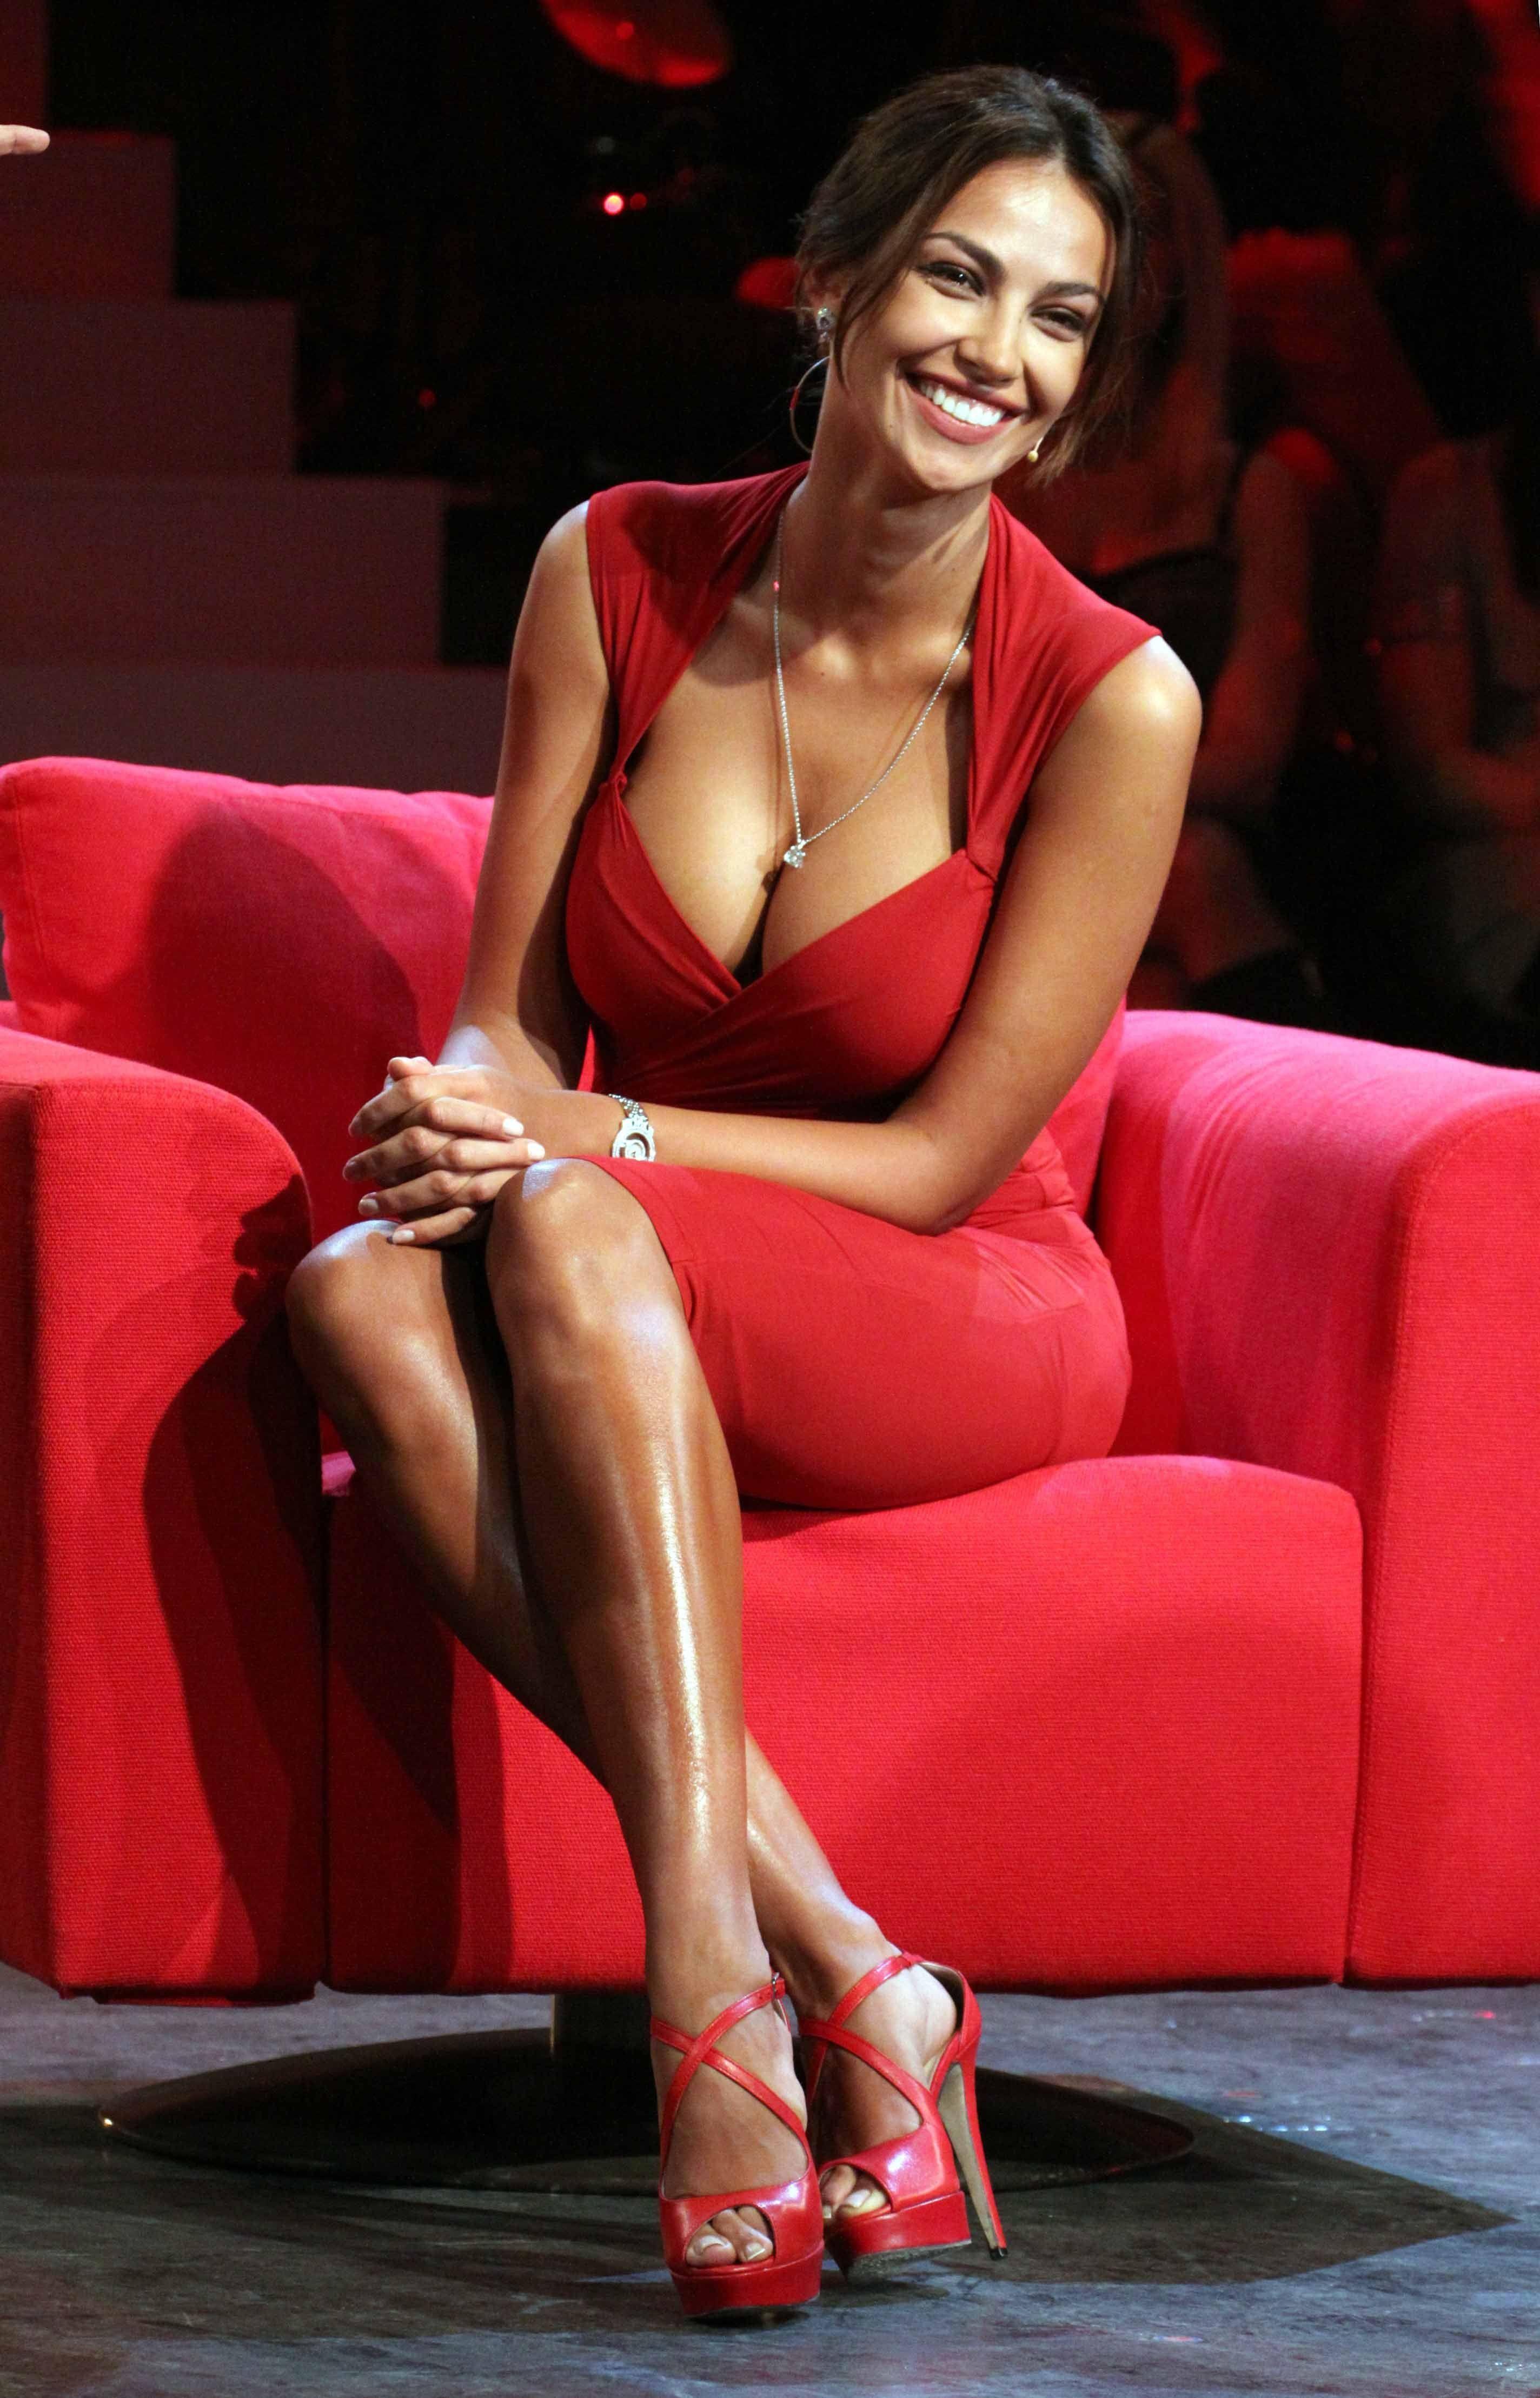 Cleavage Madalina Diana Ghenea nudes (28 photos), Ass, Is a cute, Feet, cleavage 2020